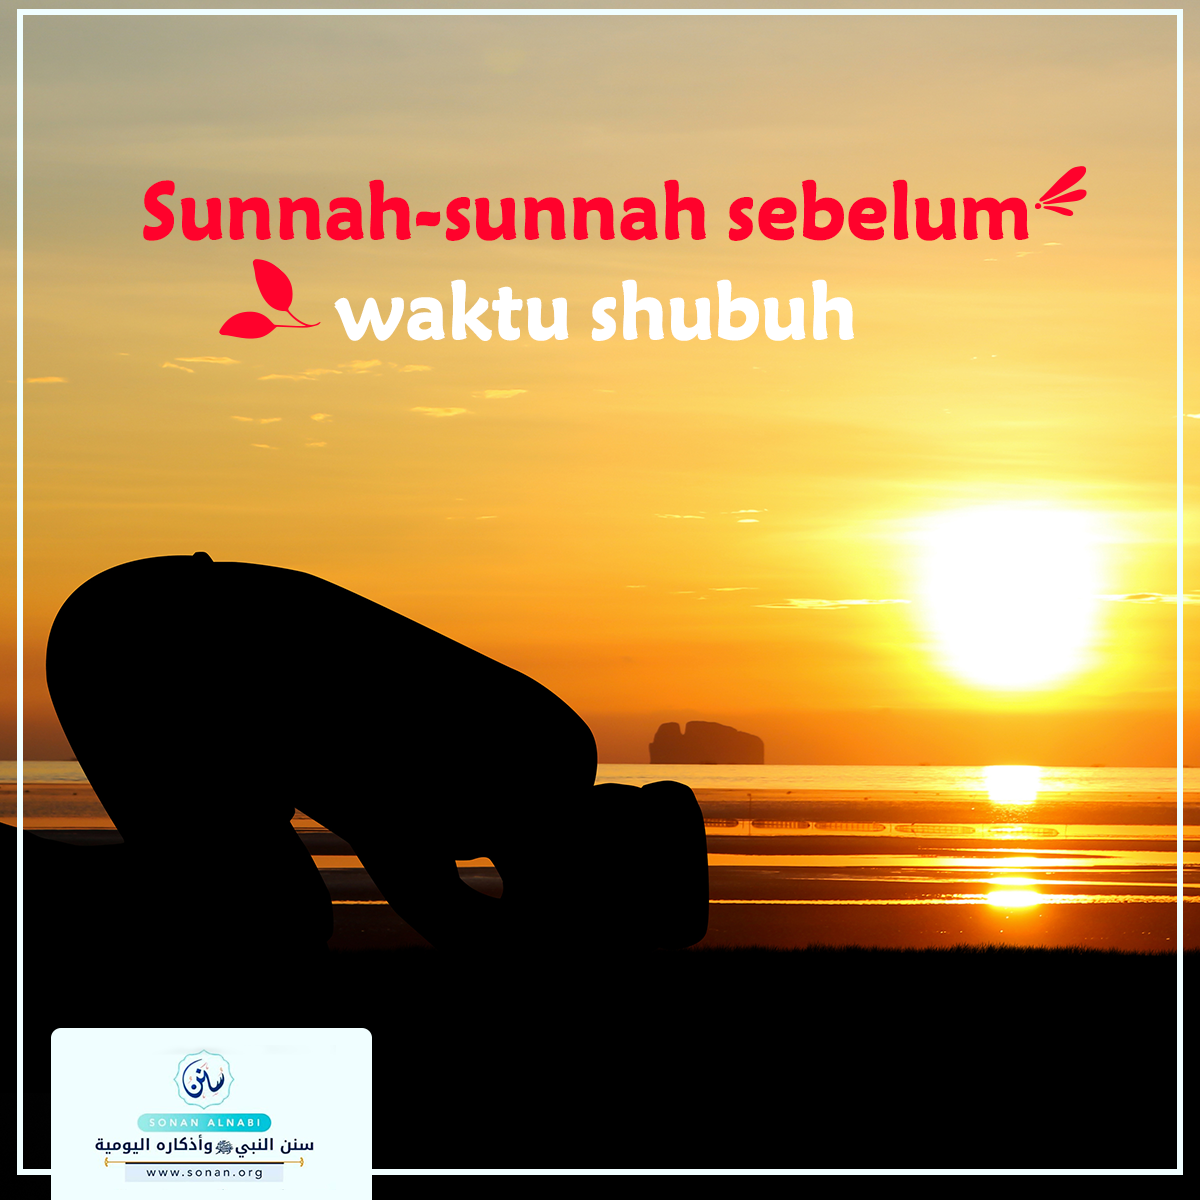 Sunnah-sunnah sebelum waktu shubuh